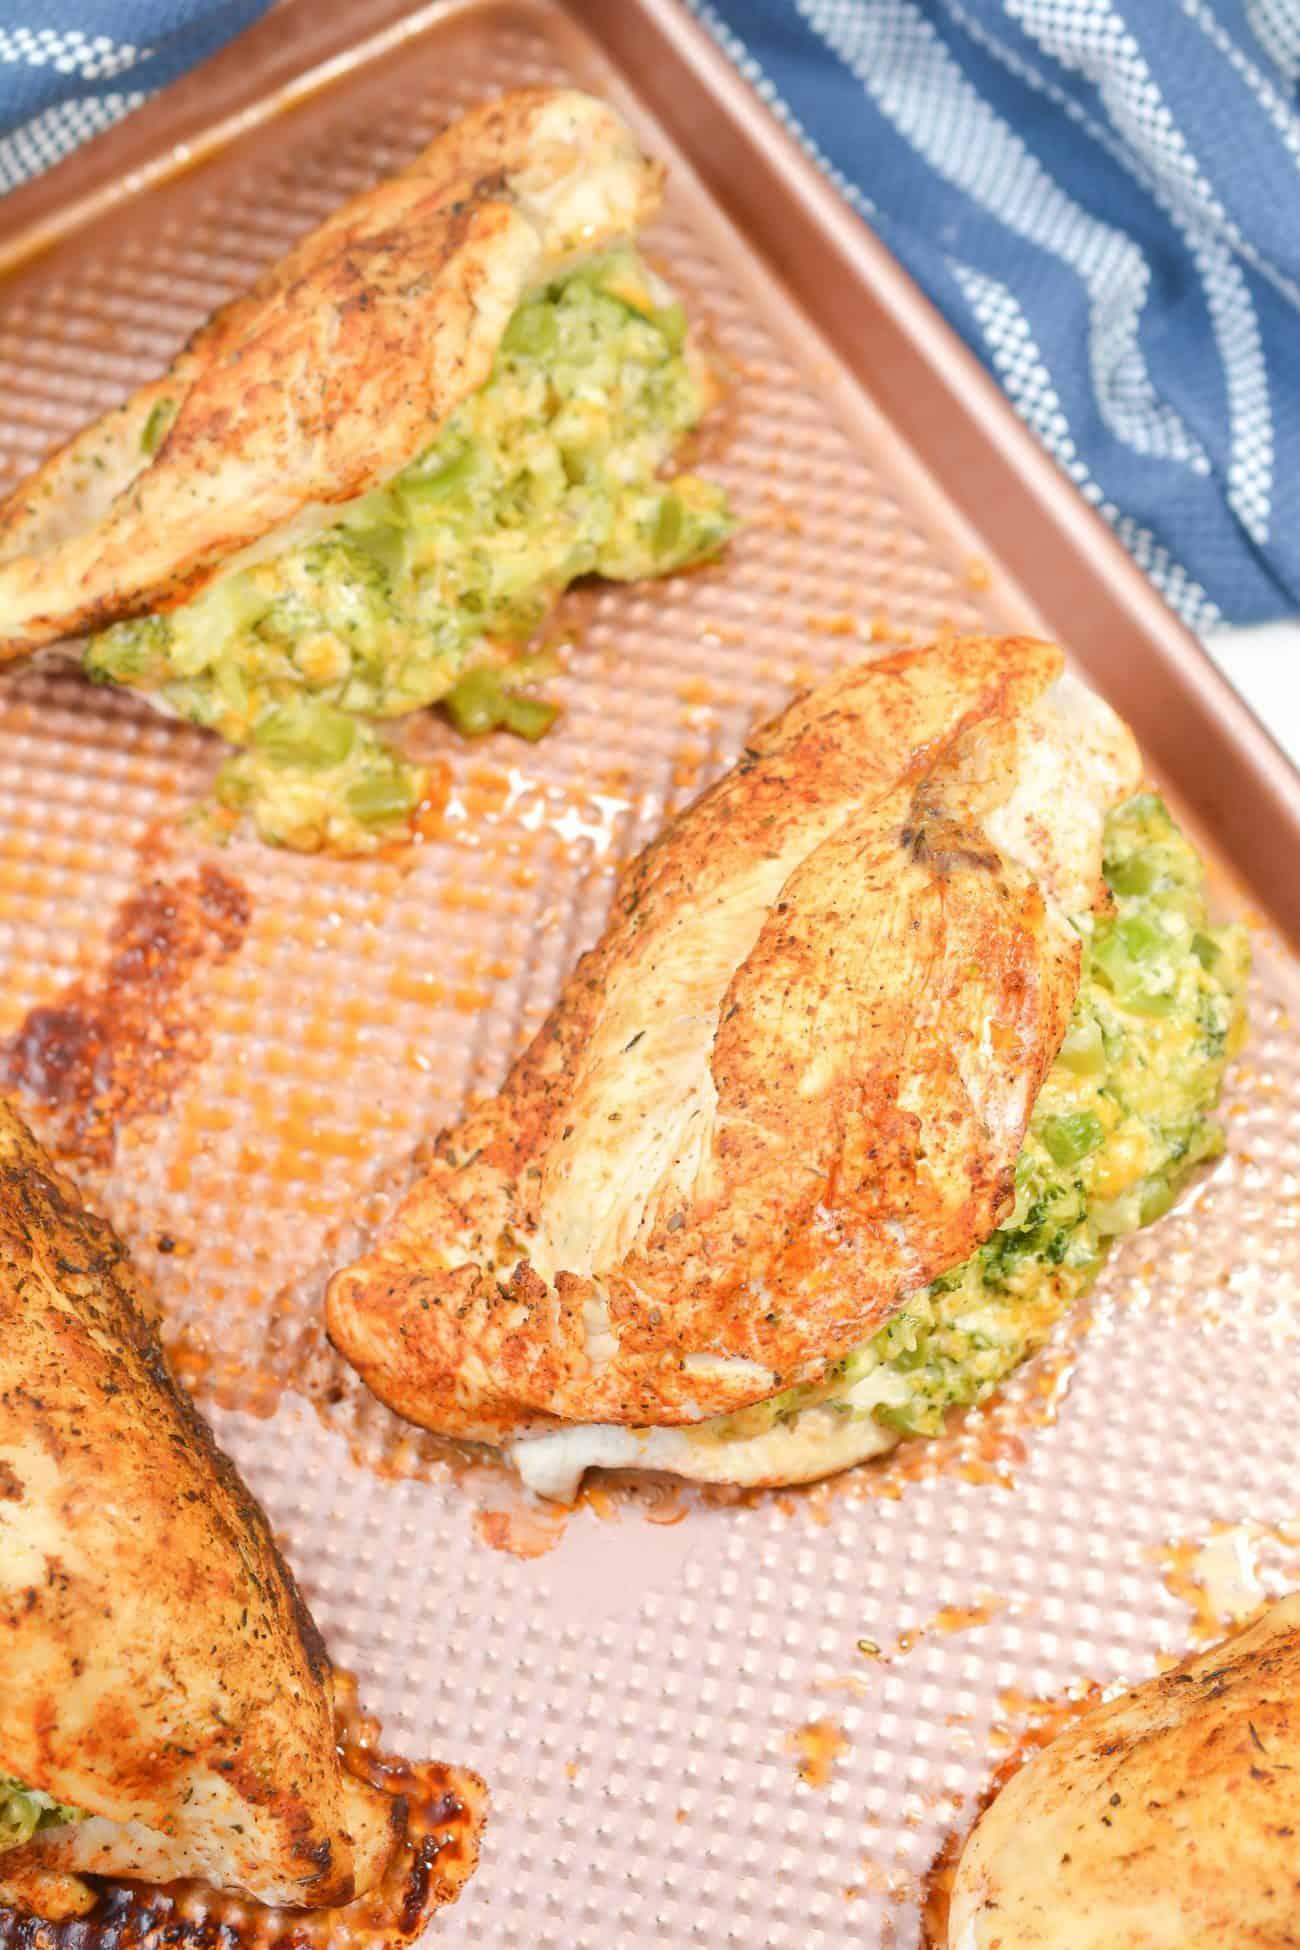 Cheesy Broccoli Stuffed Chicken Breast